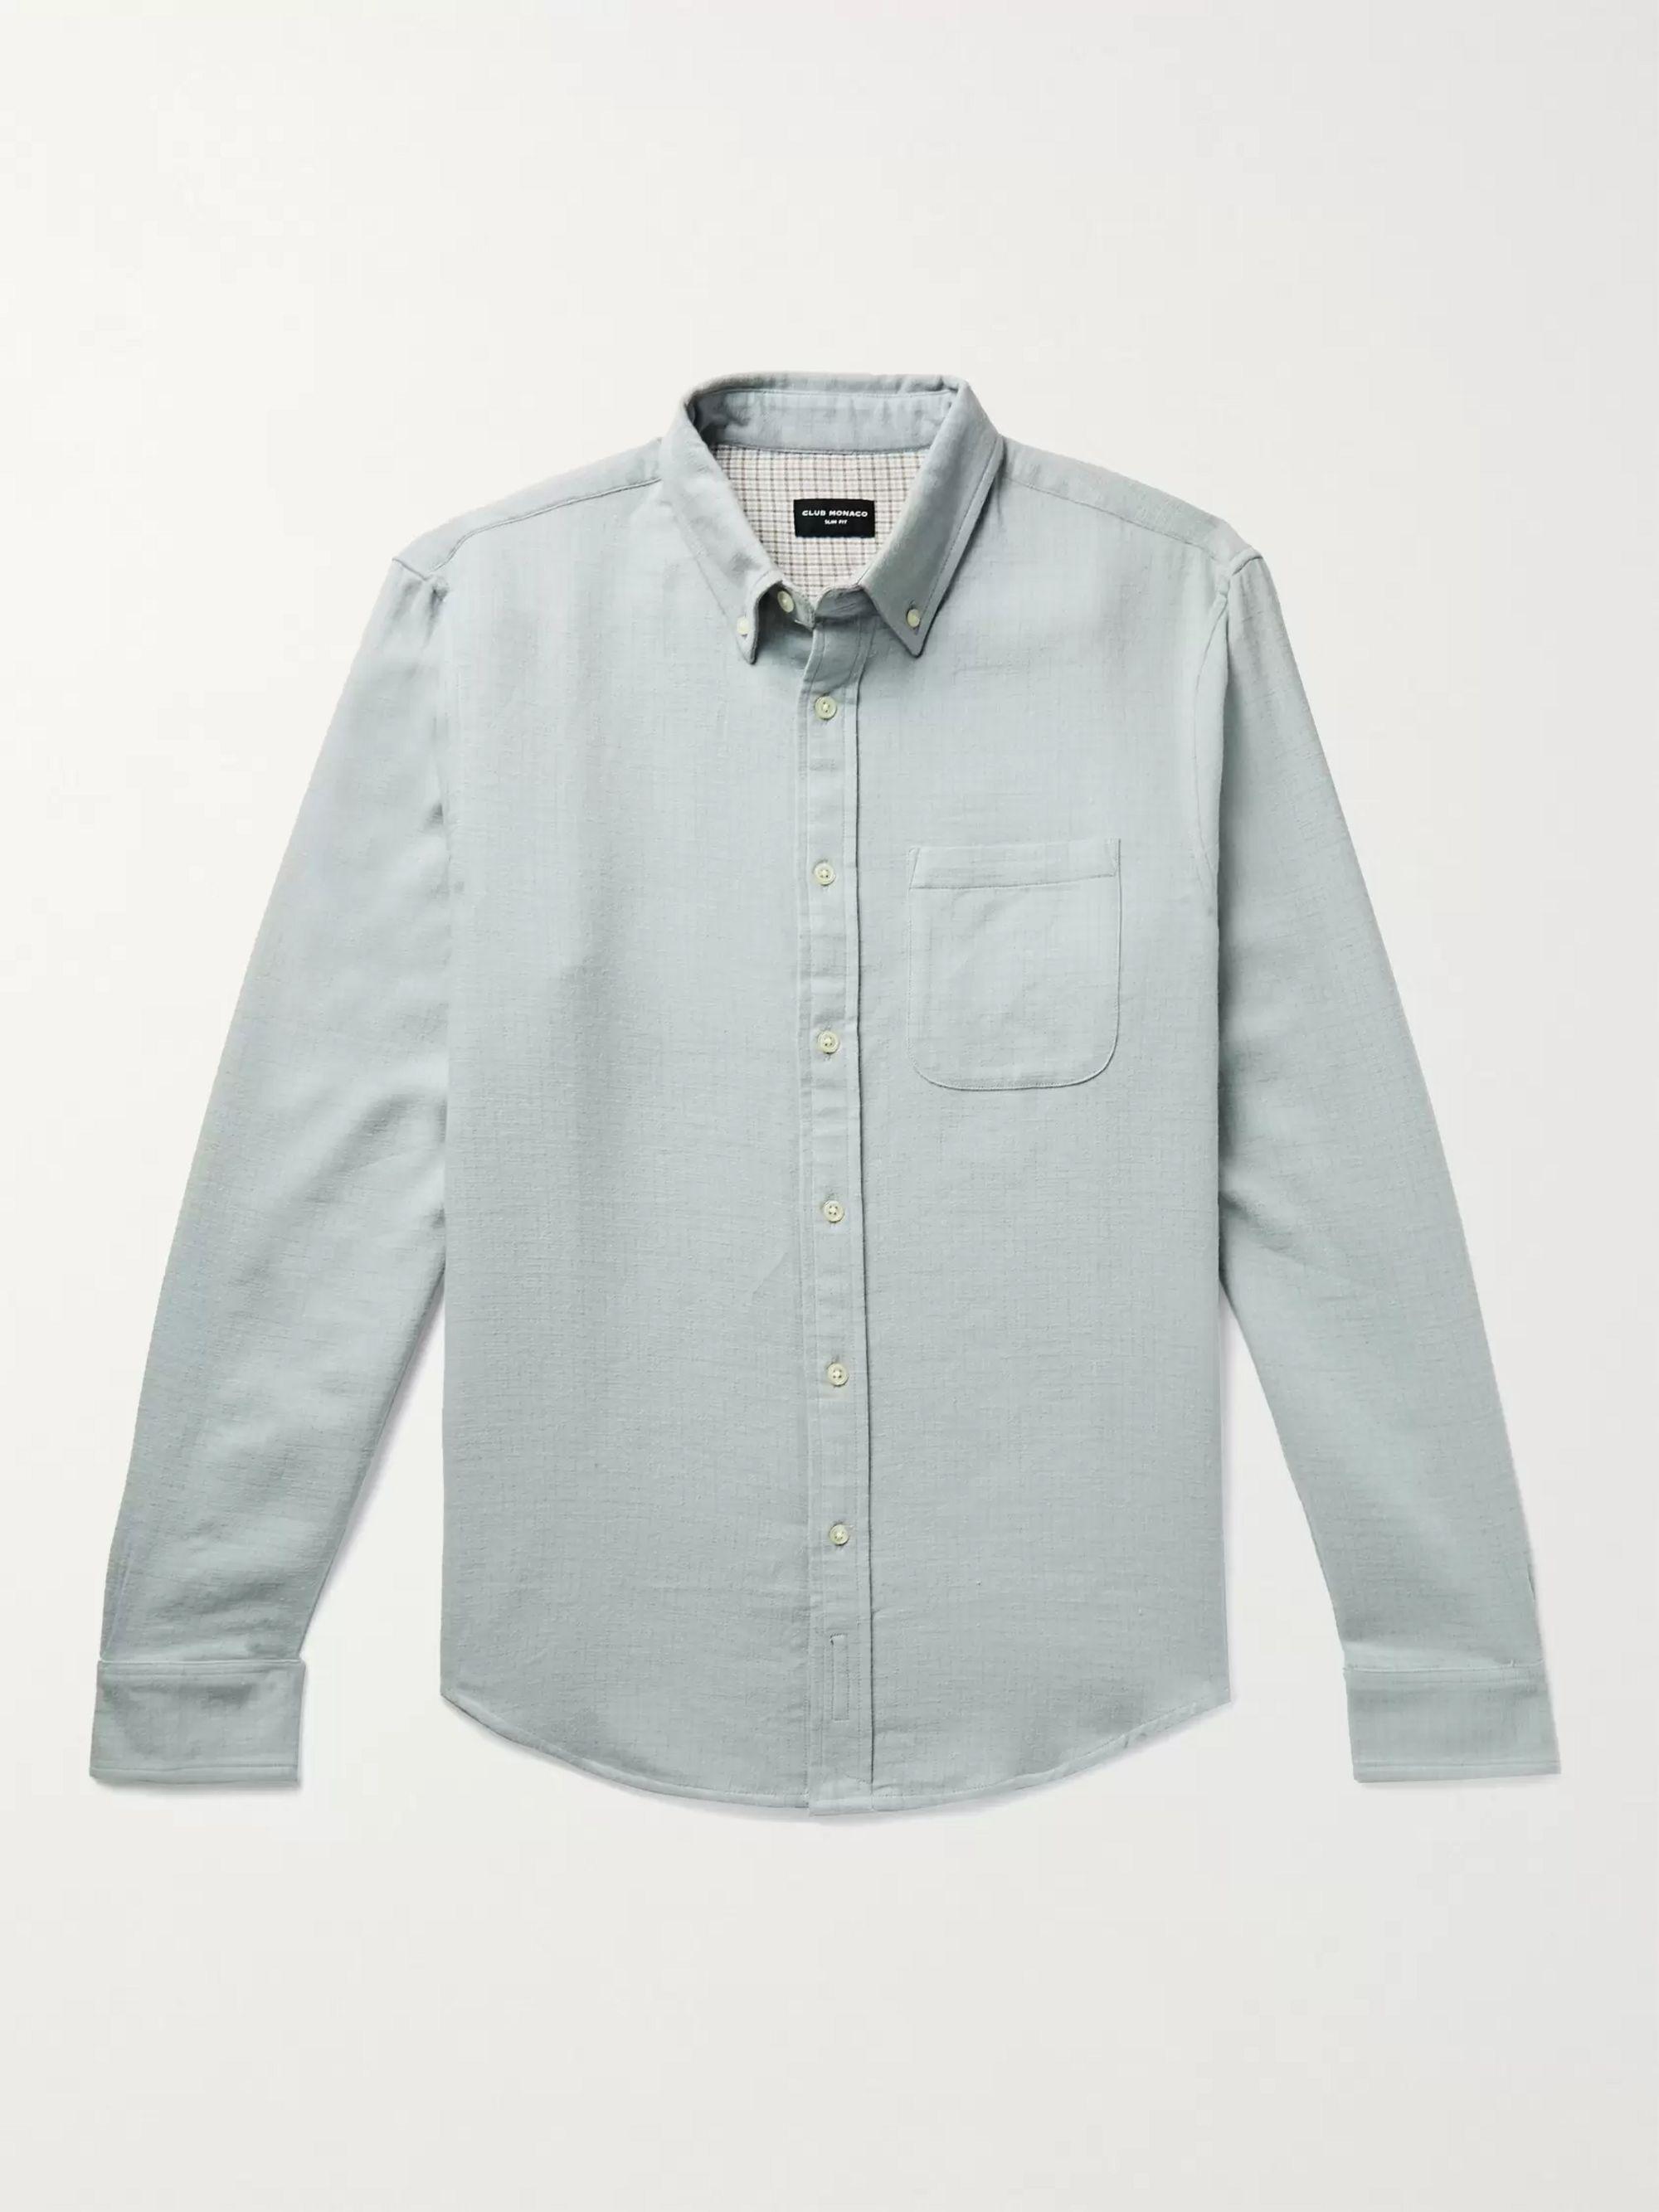 CLUB MONACO Slim-Fit Button-Down Collar Double-Faced Cotton Shirt